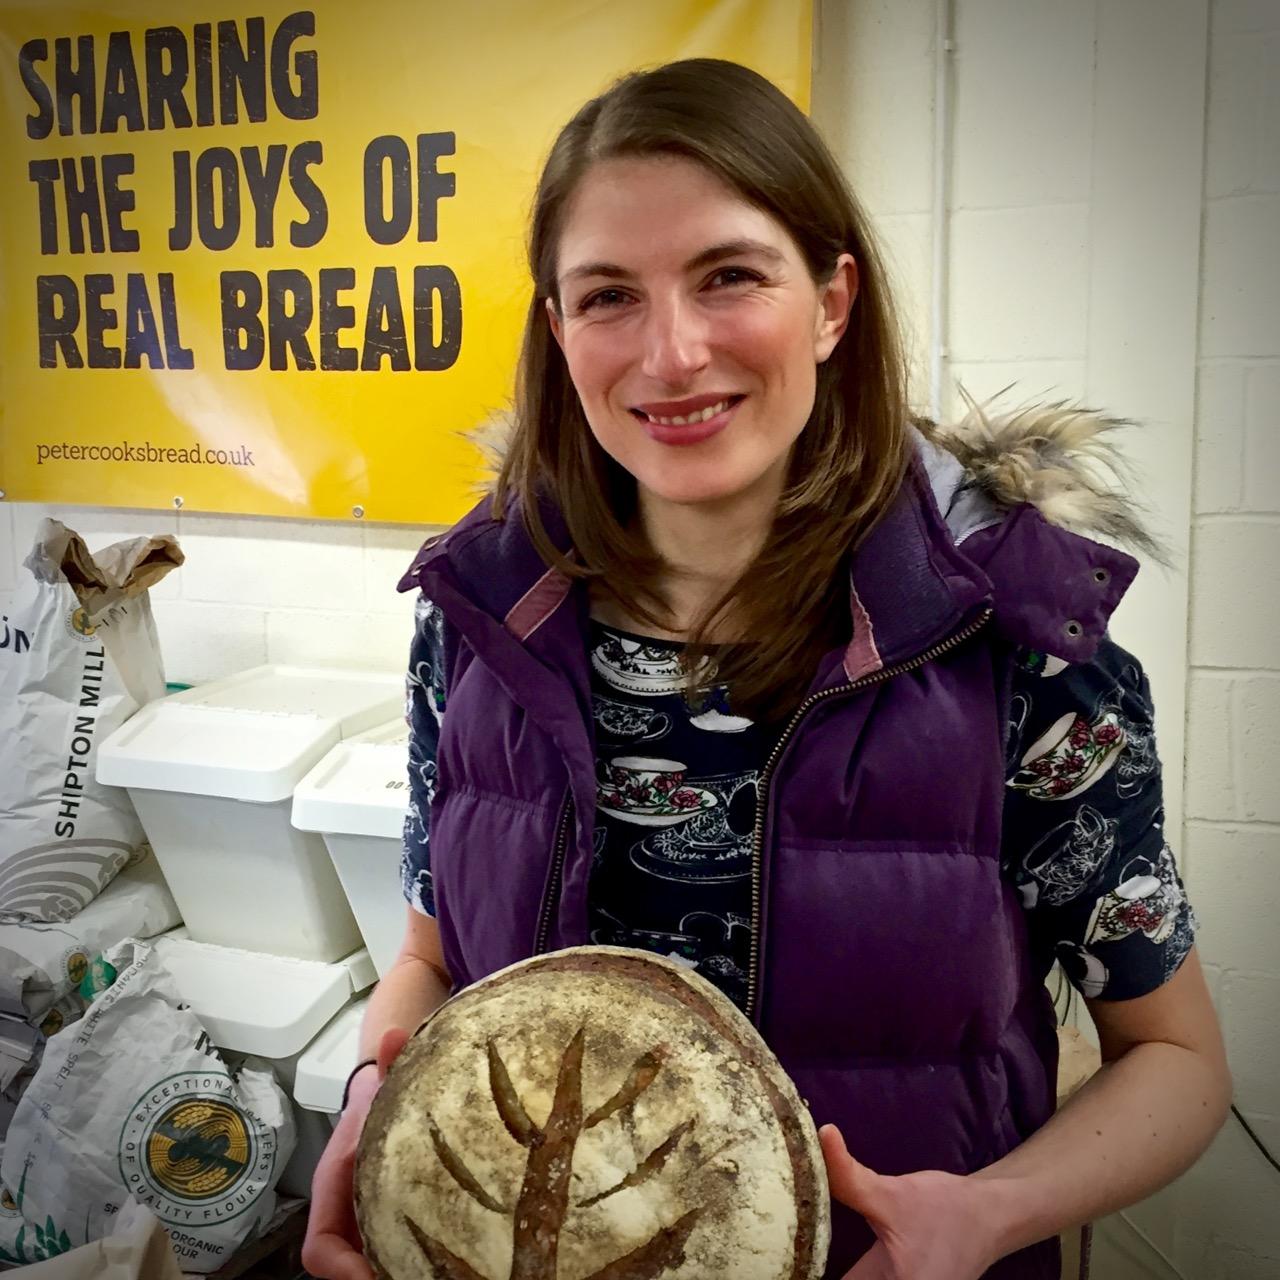 Award-winning baker Shona Kelly reveals the art to producing real artisan bread.